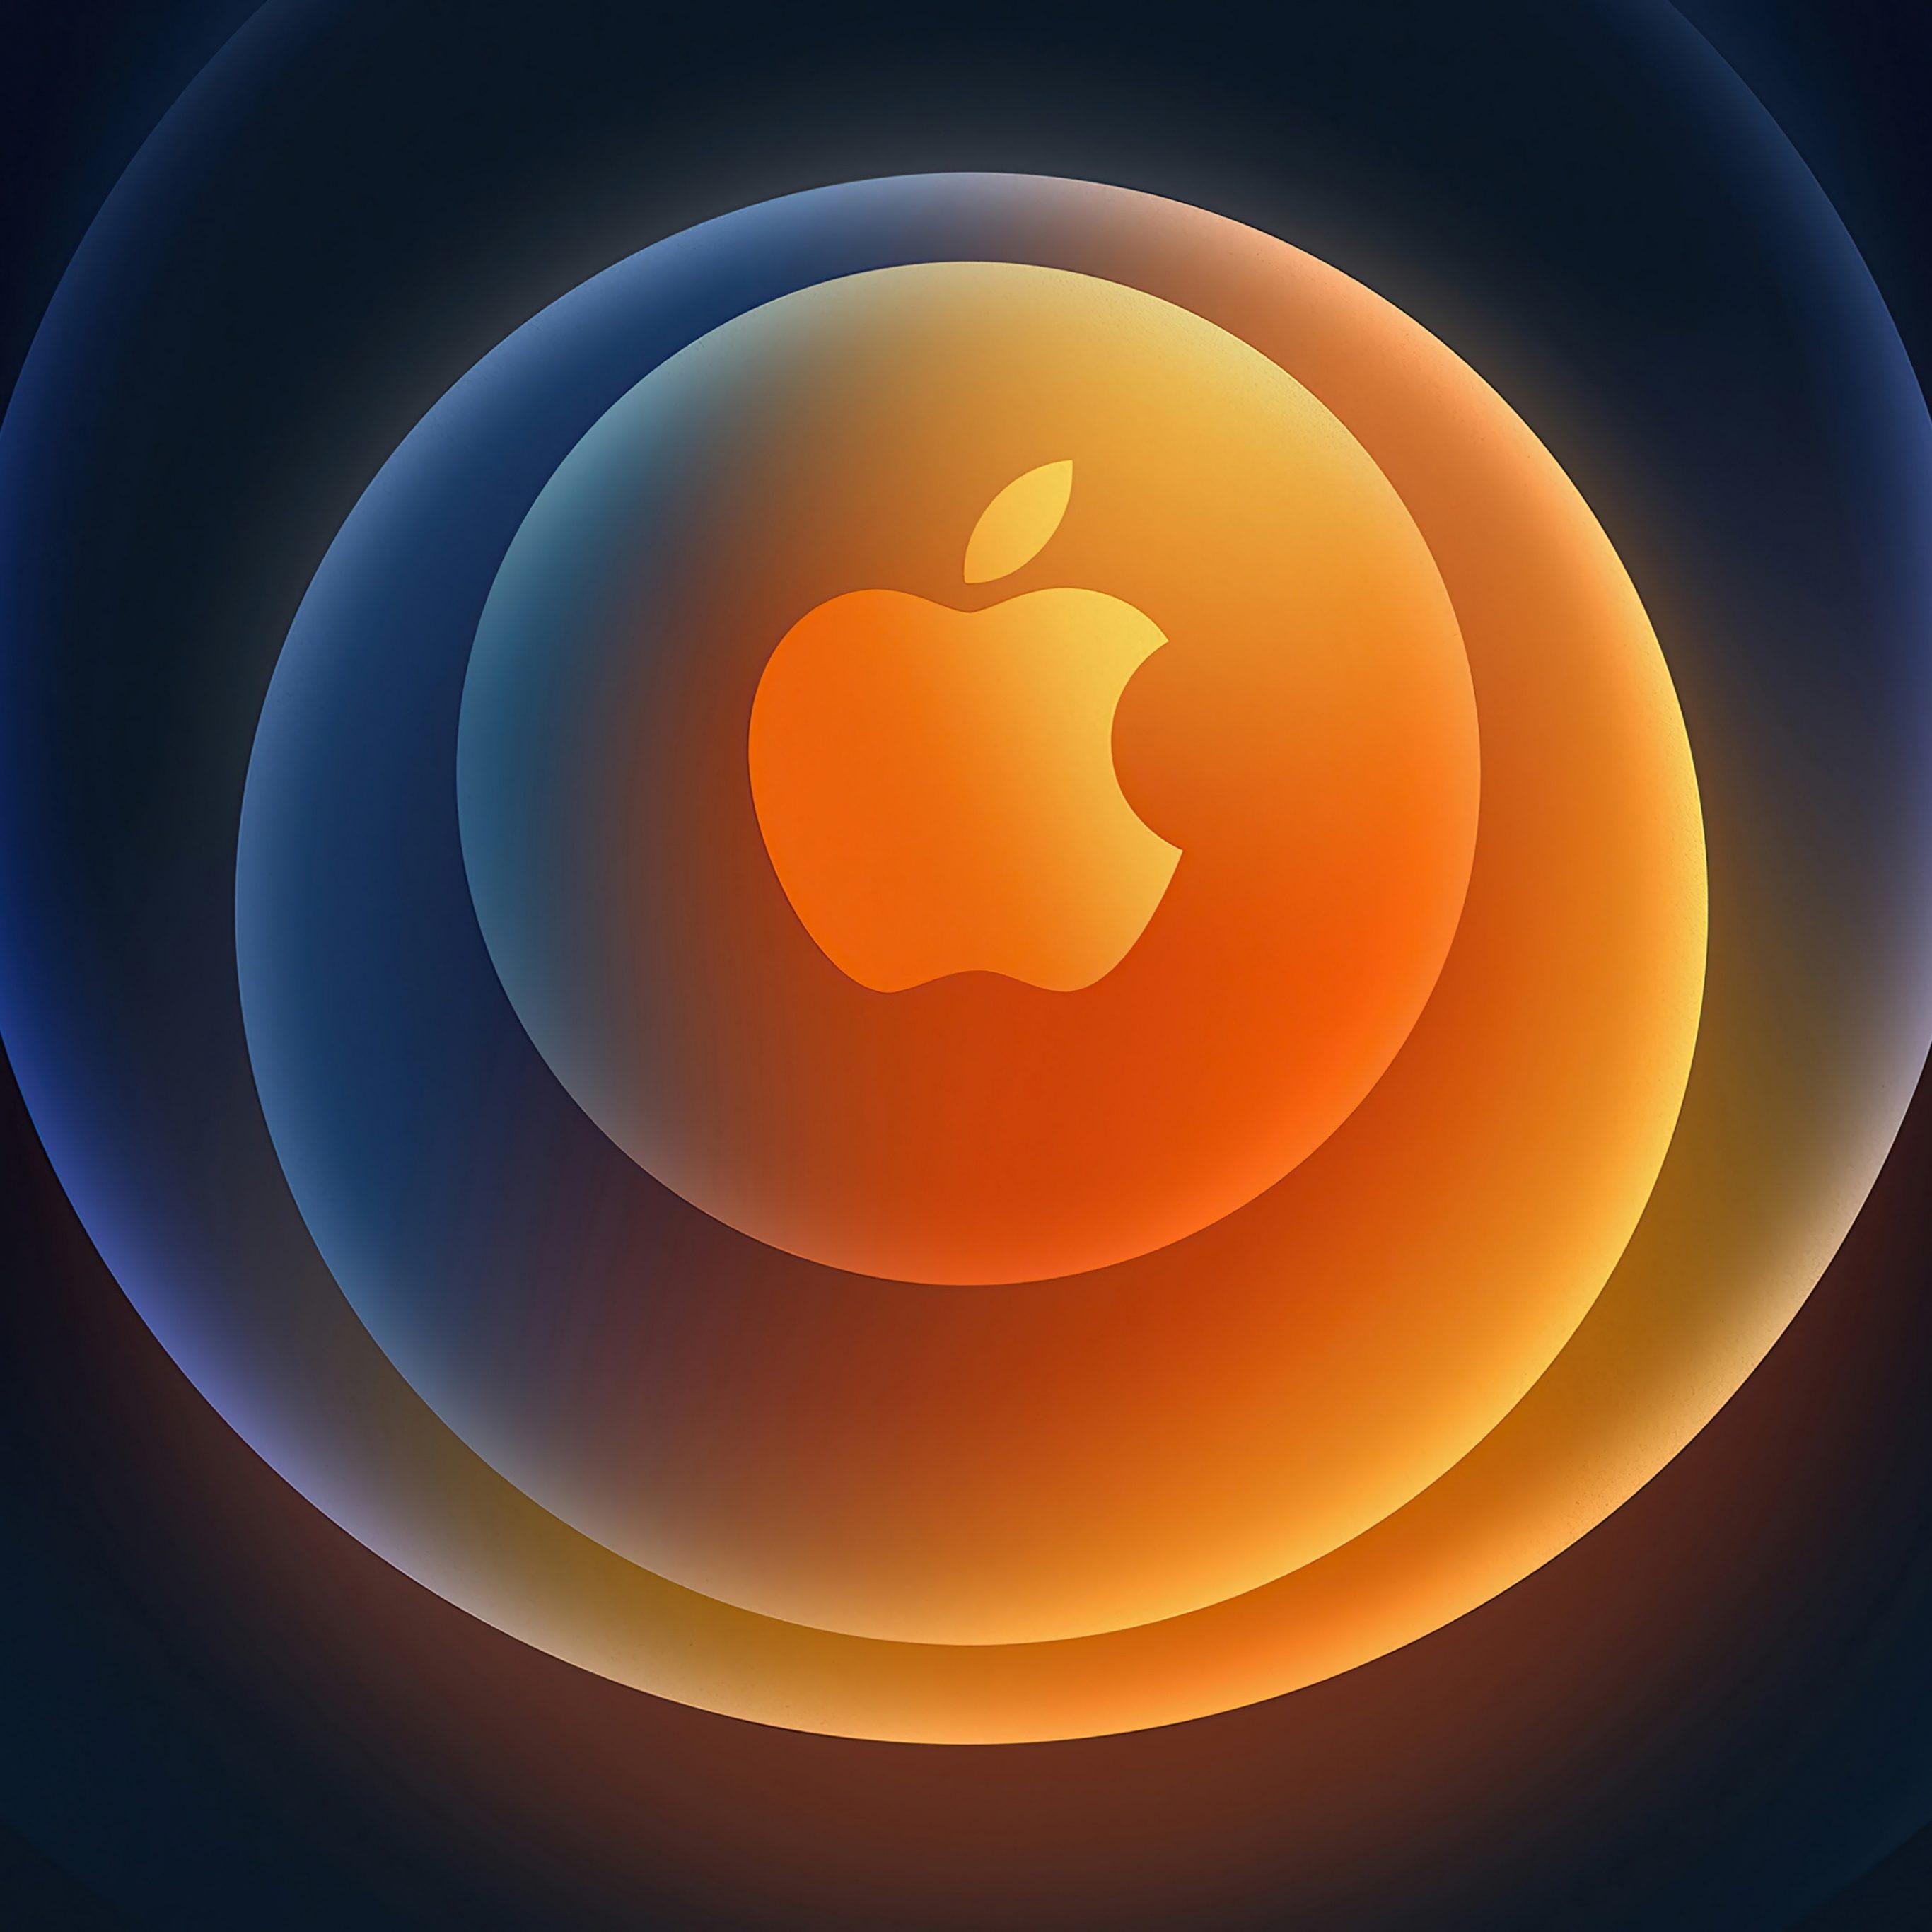 2732x2732 wallpapers 4k iPad Pro iPhone 12 Apple Logo Circles iPad Wallpaper 2732x2732 pixels resolution